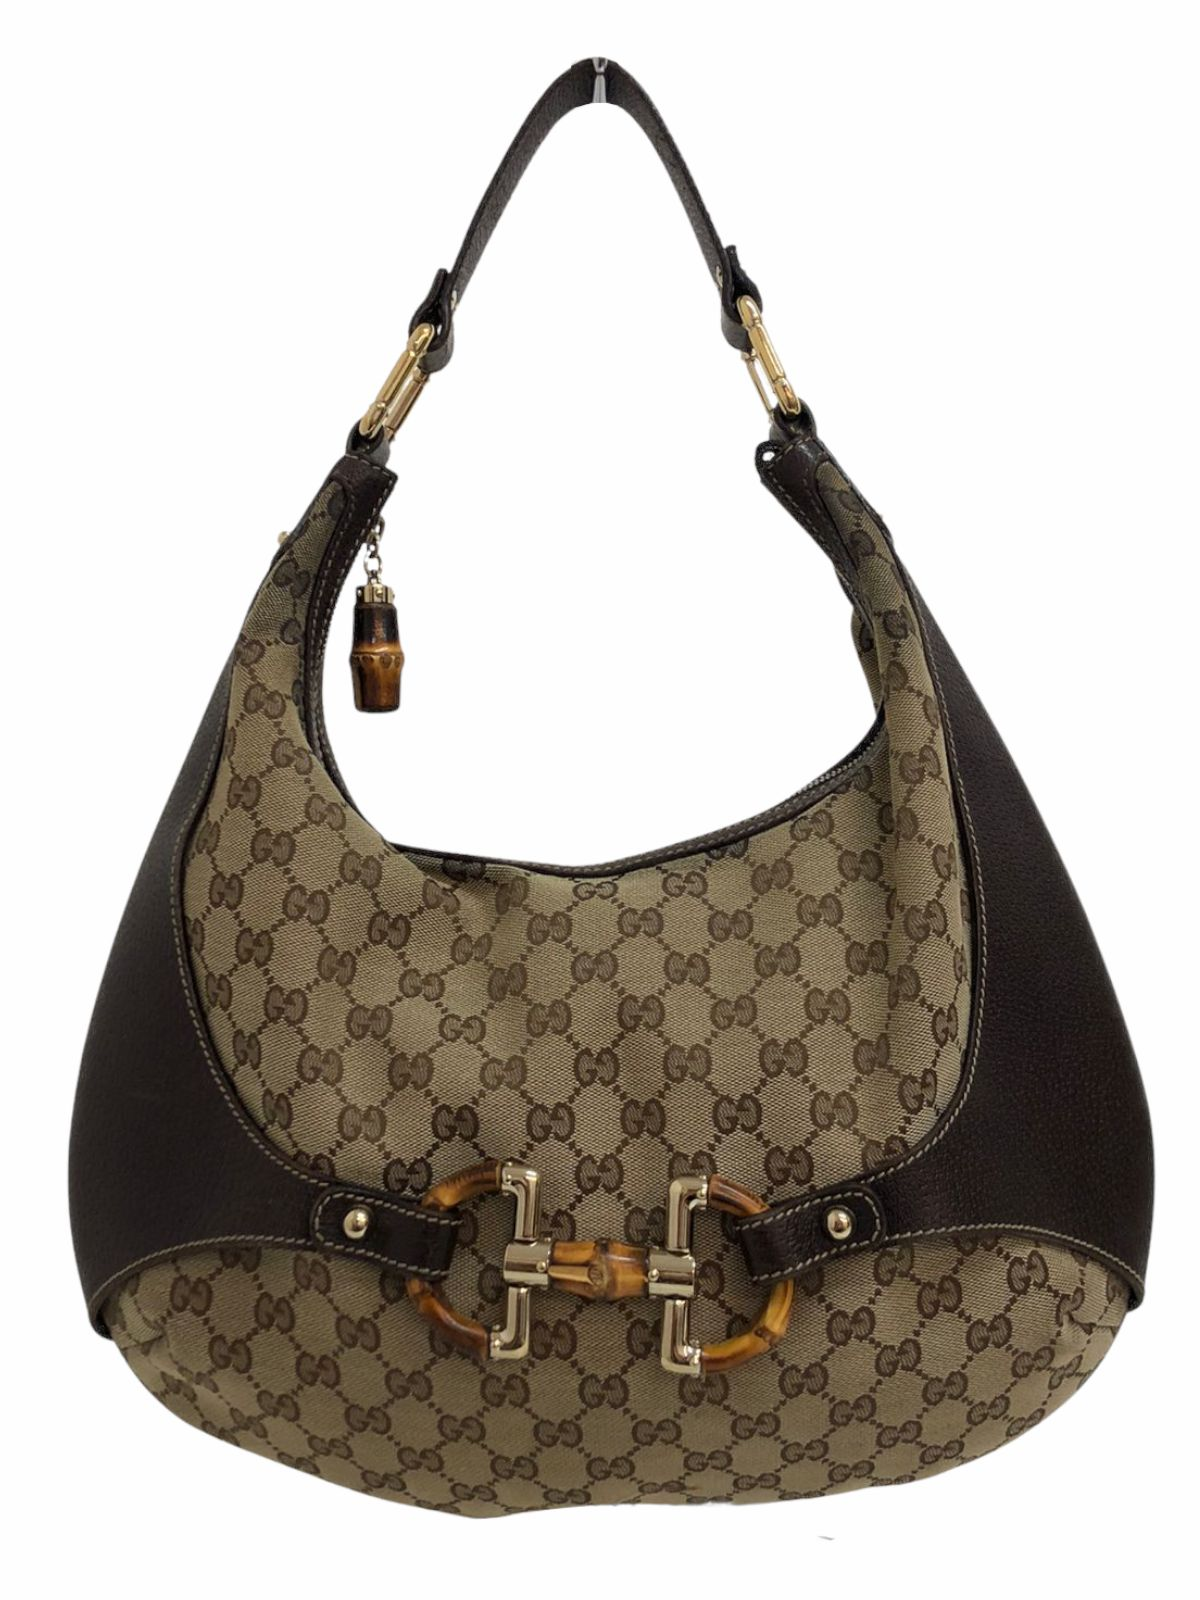 Bolsa Gucci Amalfi Hobo GG Canvas with Leather